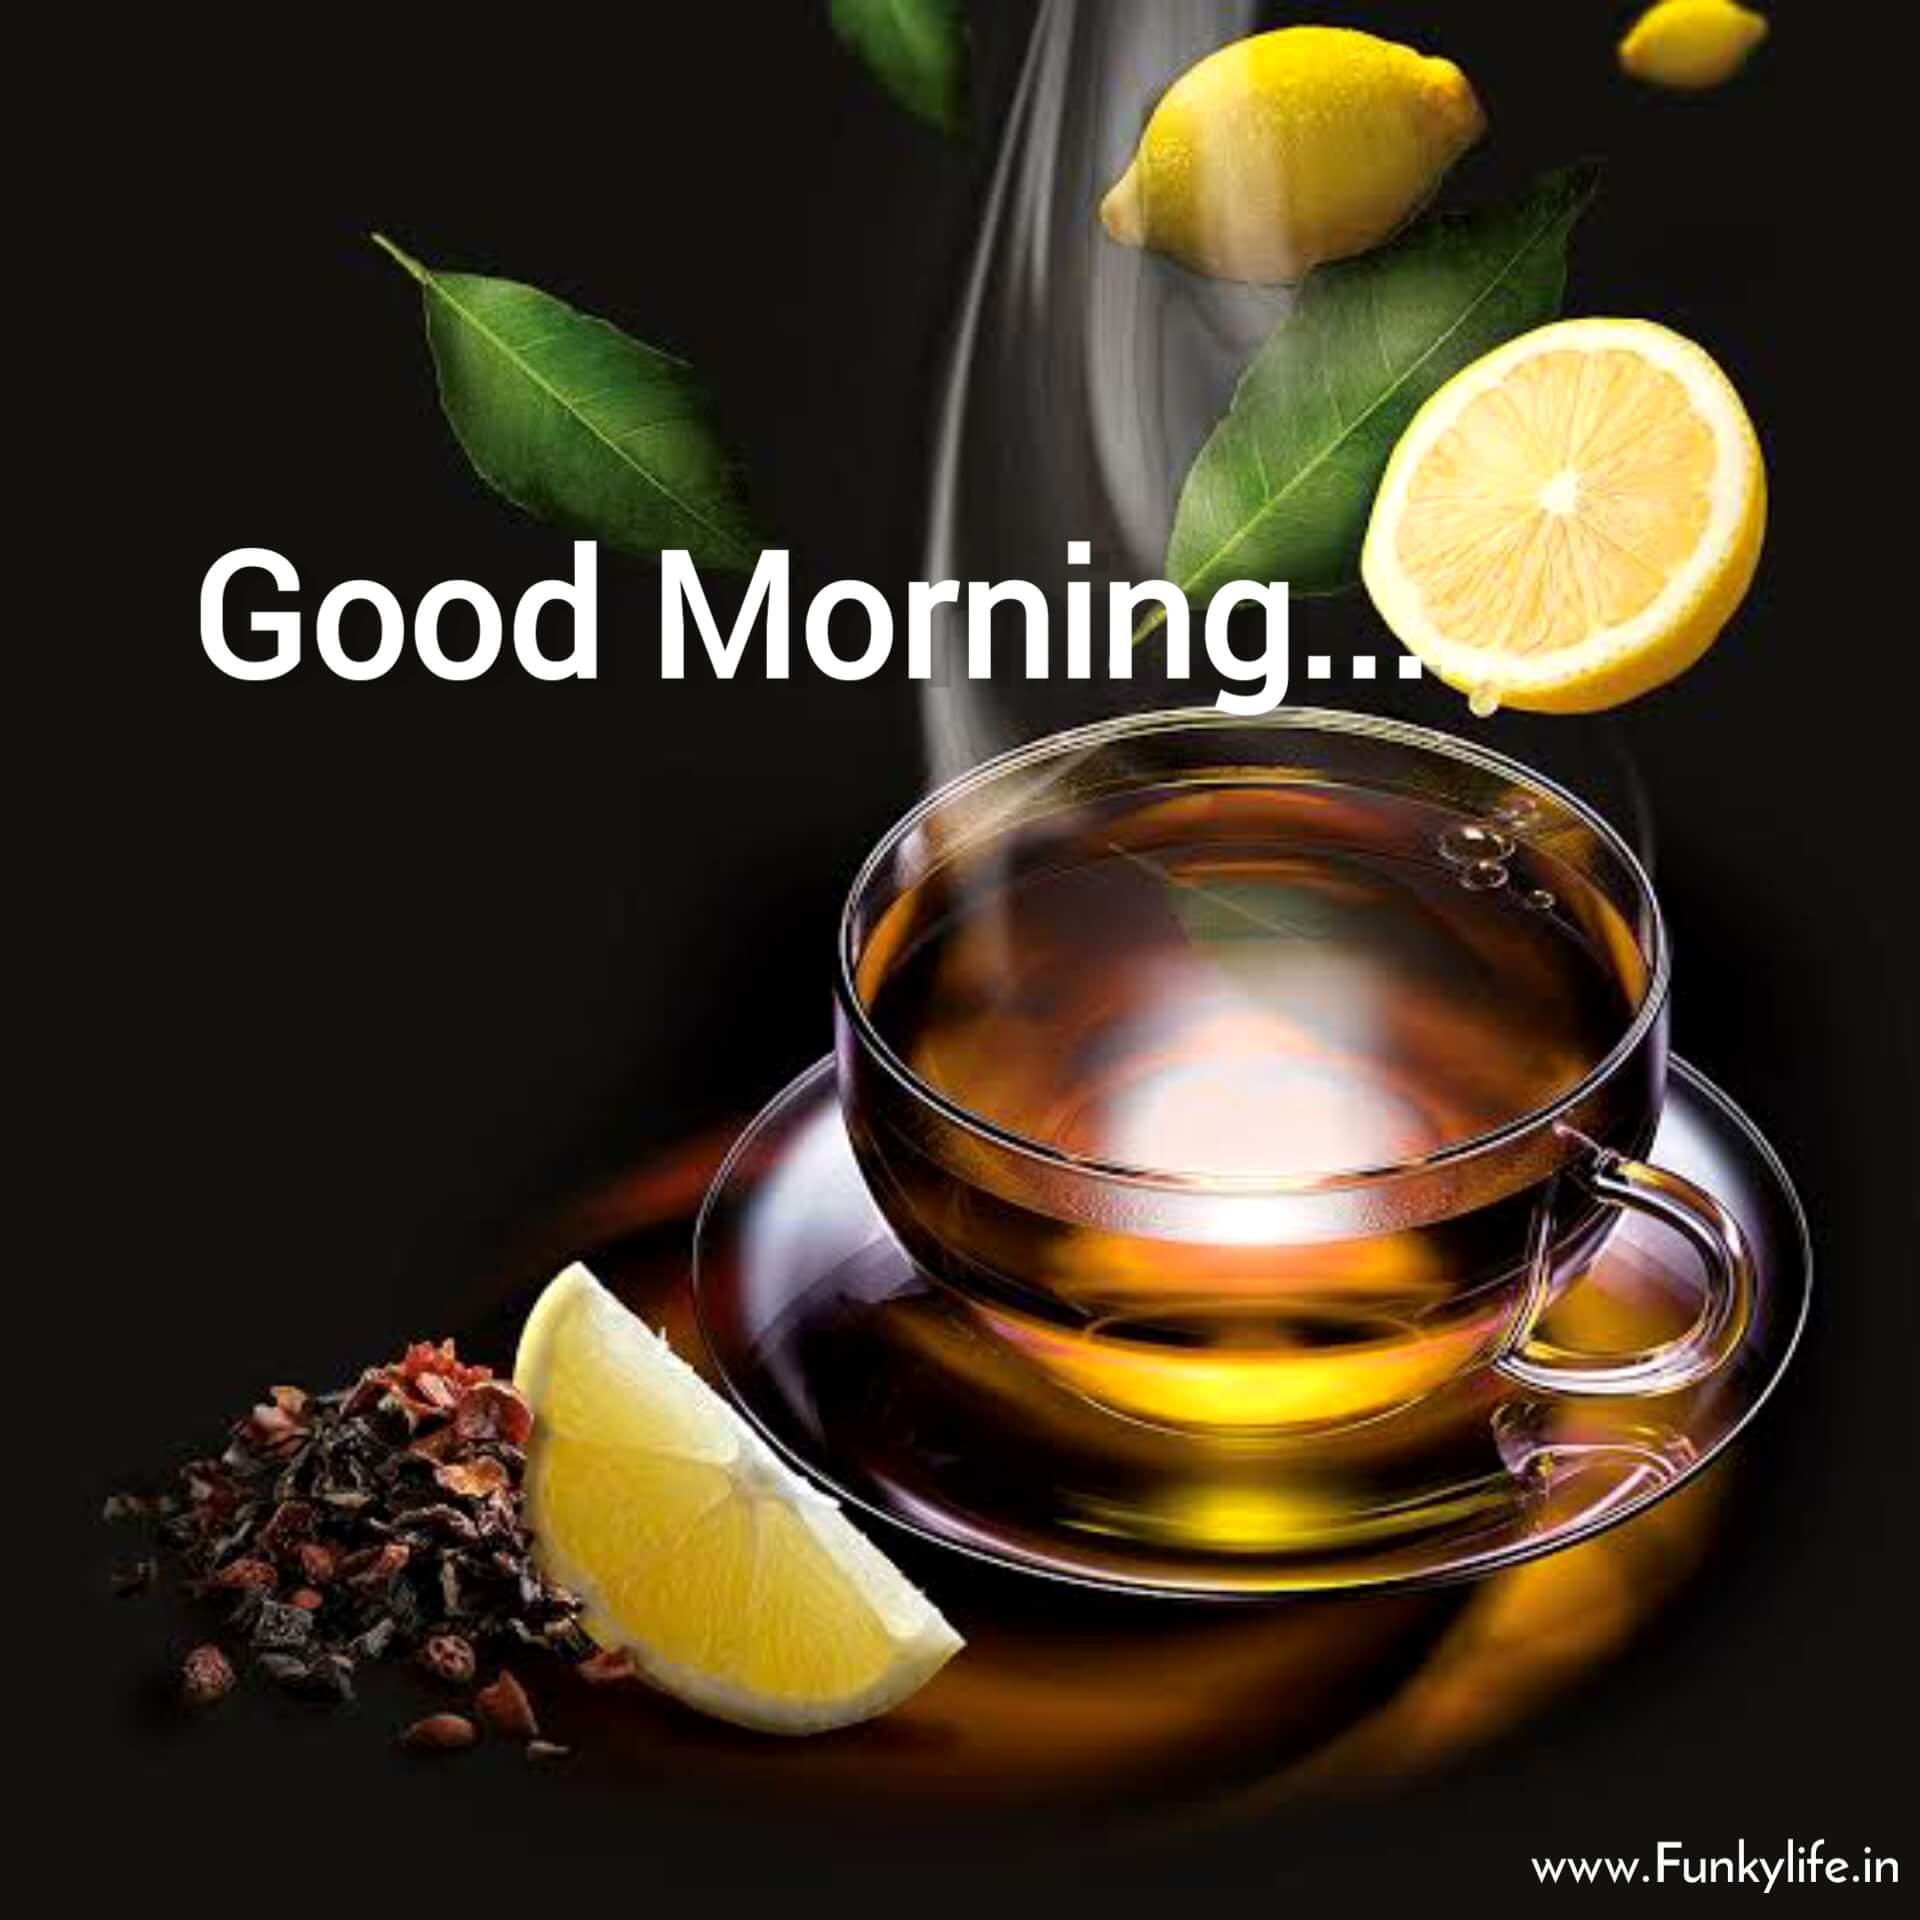 Lemon Tea Good Morning Image